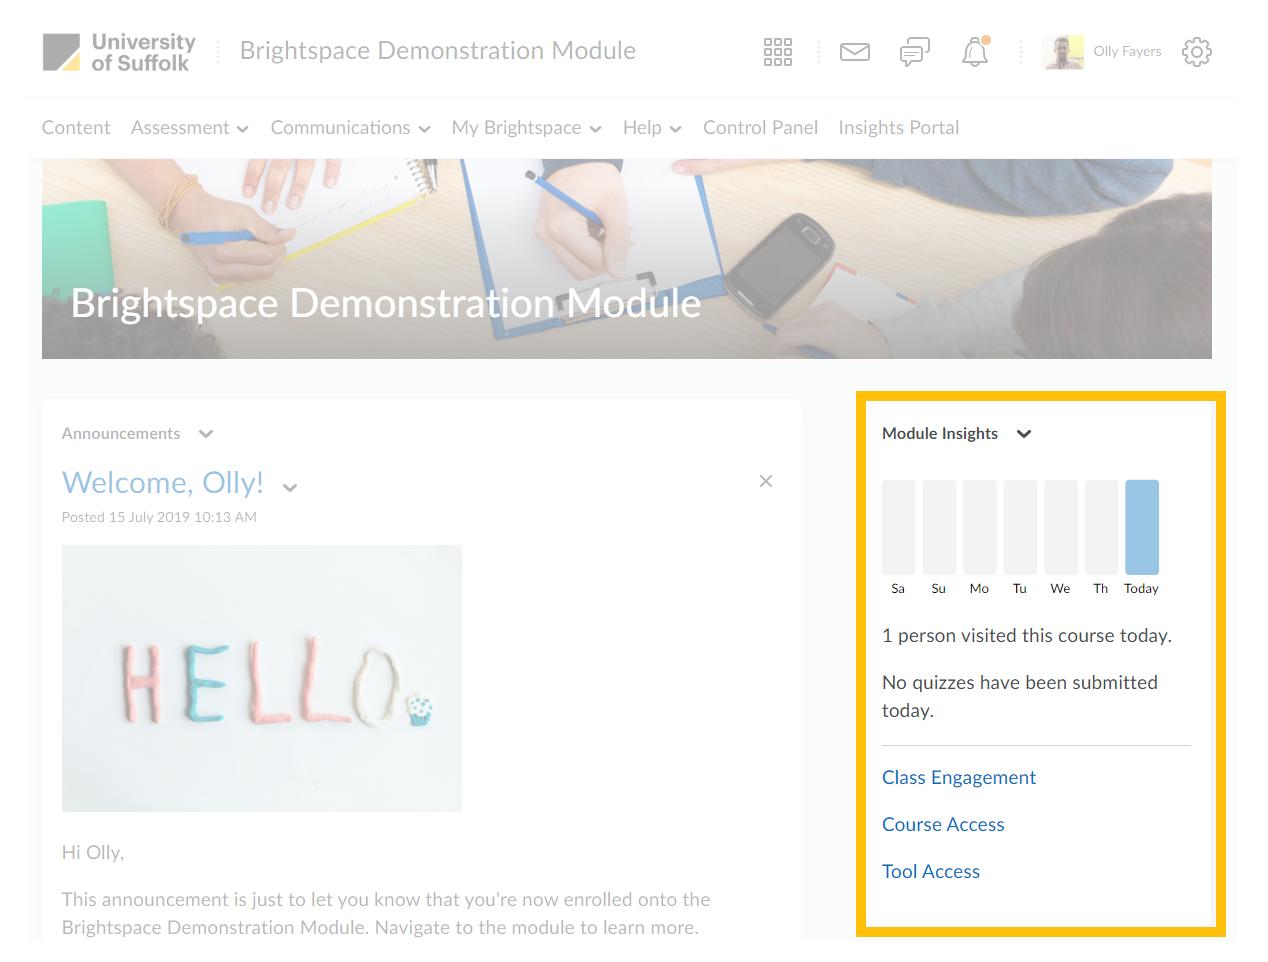 module insights widget